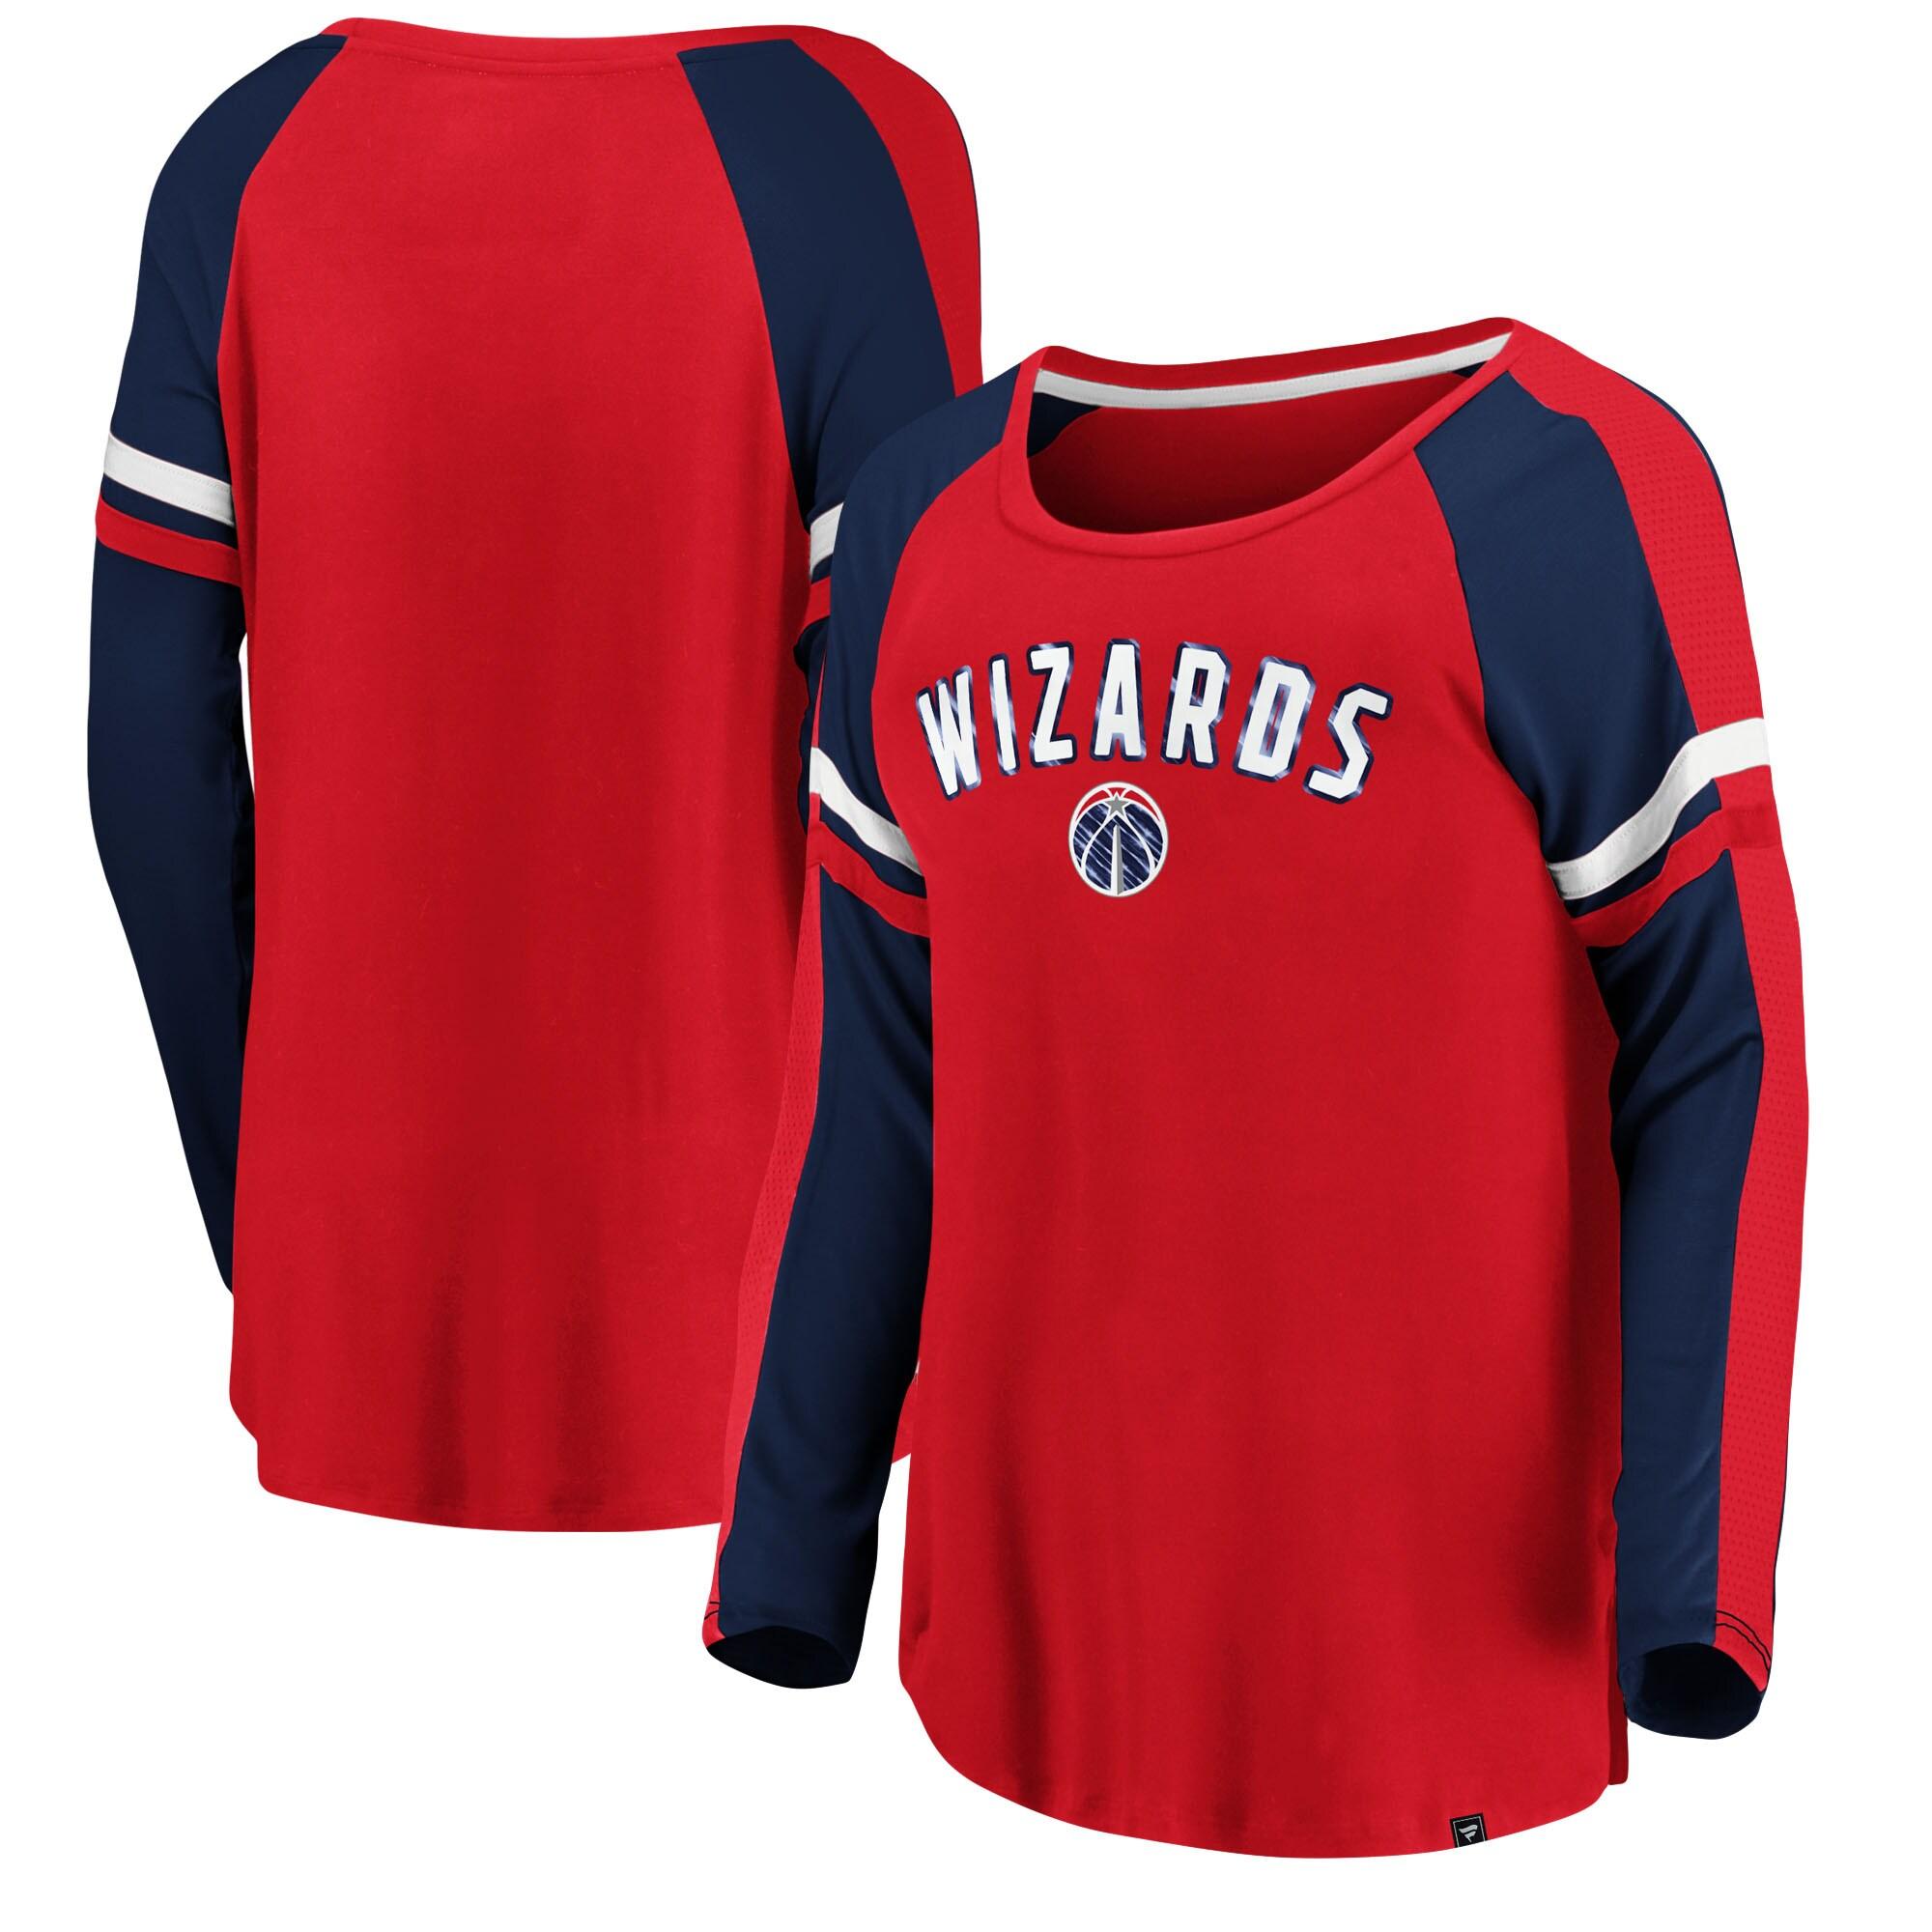 Washington Wizards Fanatics Branded Women's Iconic Flashy Long Sleeve T-Shirt - Red/Navy